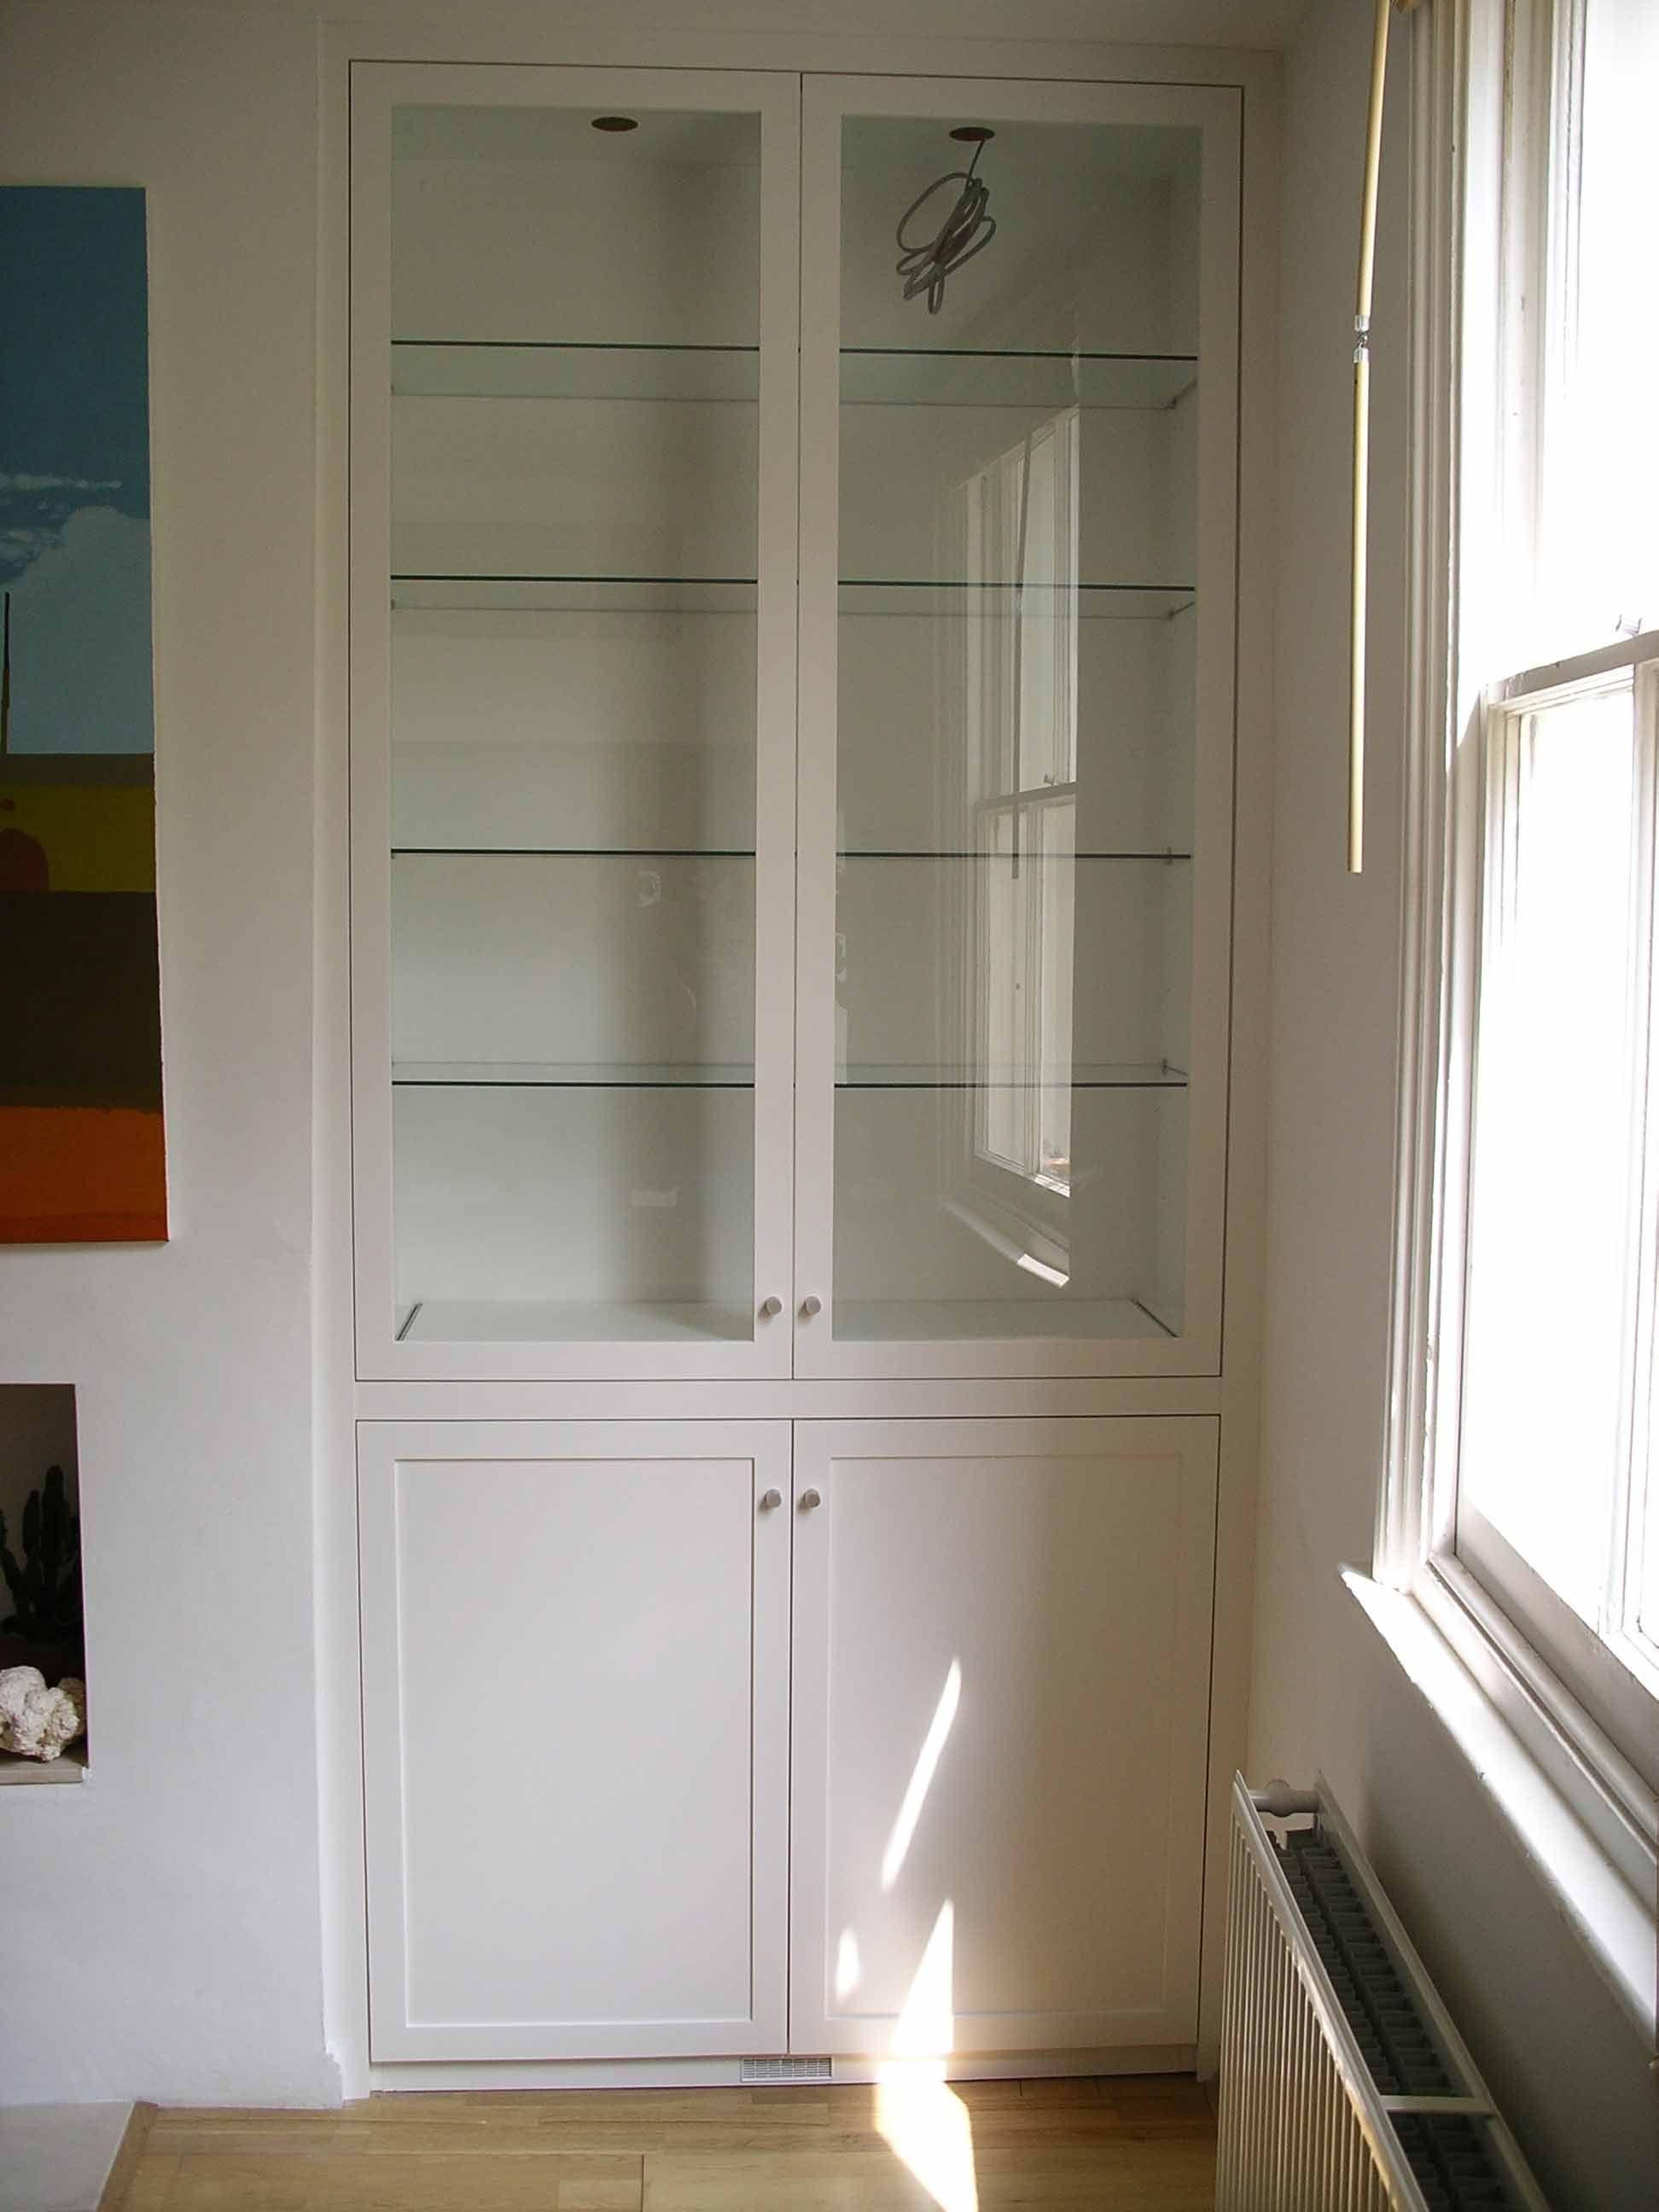 Glazed Kitchen Cupboard Doors Glazed Alcove Cabinet Flush Uniform Depth Except Using White